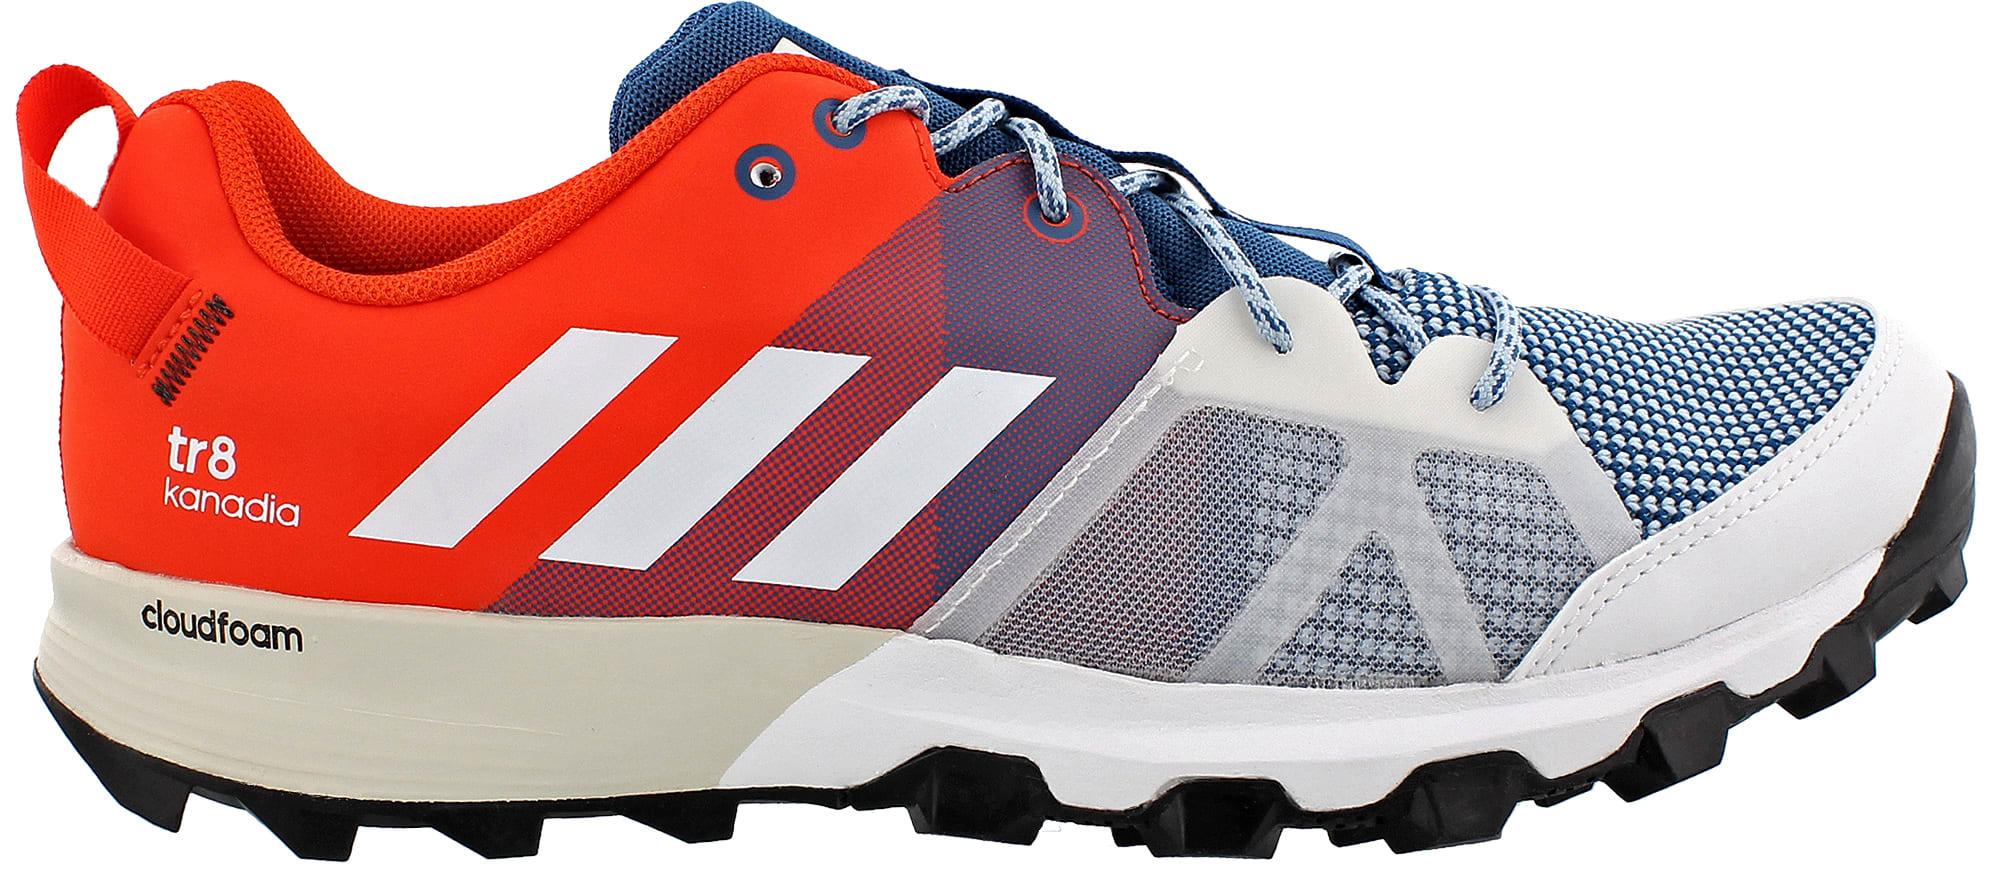 0e1bac7154 Adidas Kanadia 8 TR Hiking Shoes - thumbnail 1